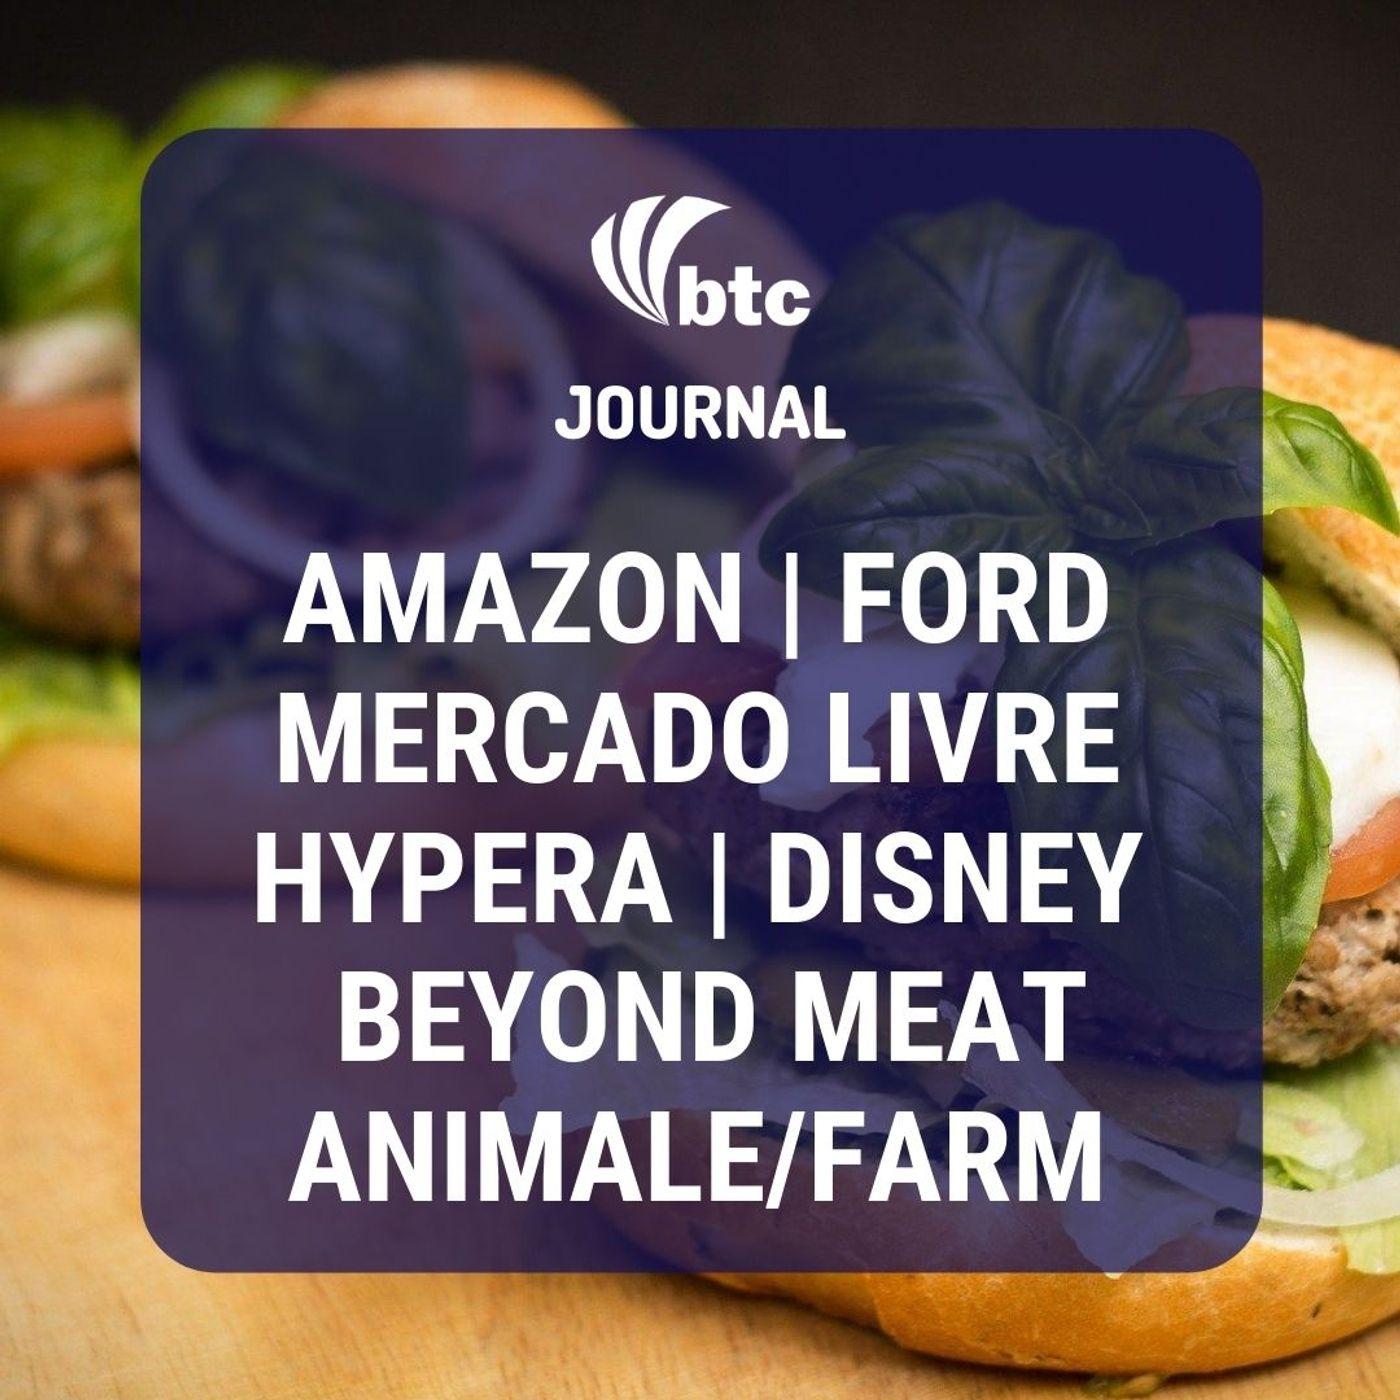 Amazon, Mercado Livre, Ford, Hypera, Beyond Meat, Animale/Farm | BTC Journal 06/08/20